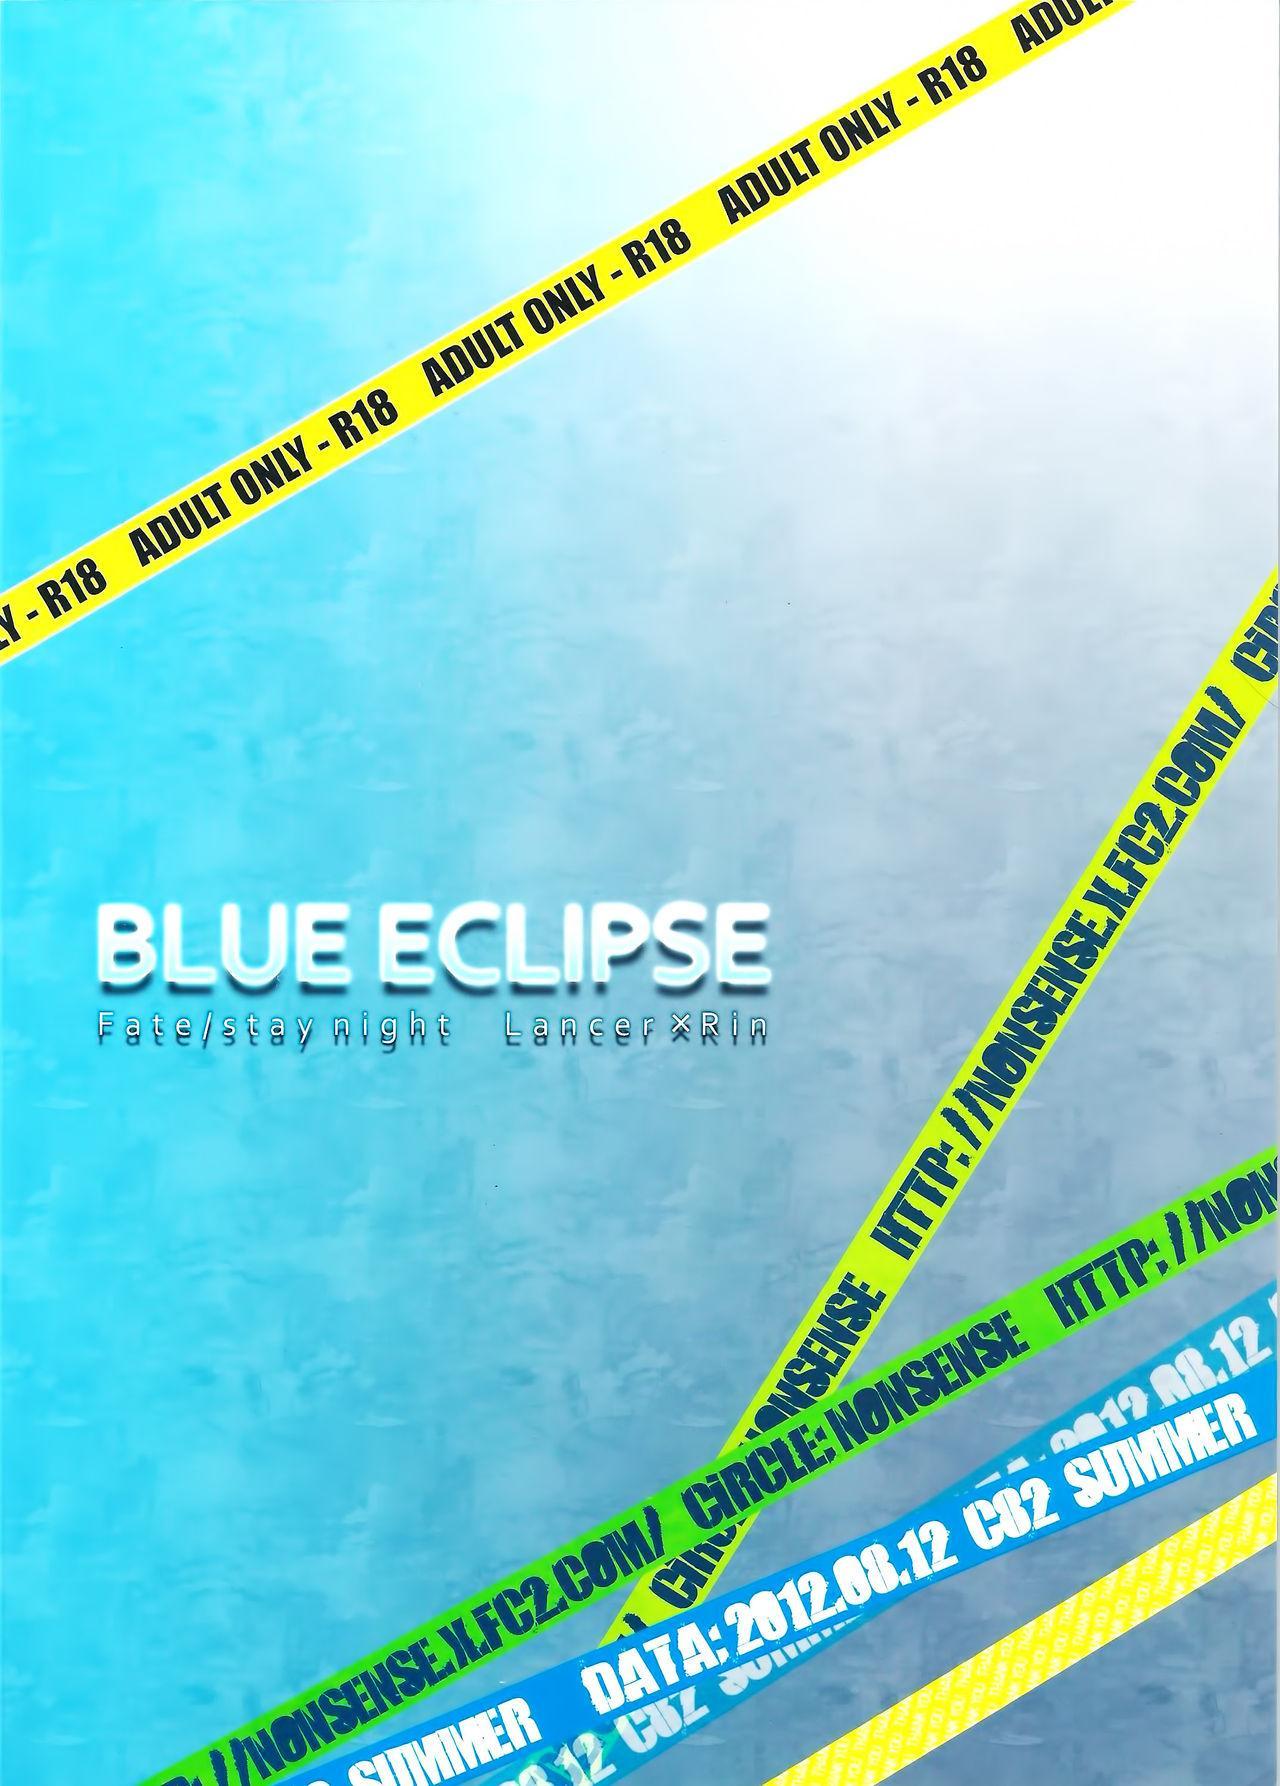 BLUE ECLIPSE 24